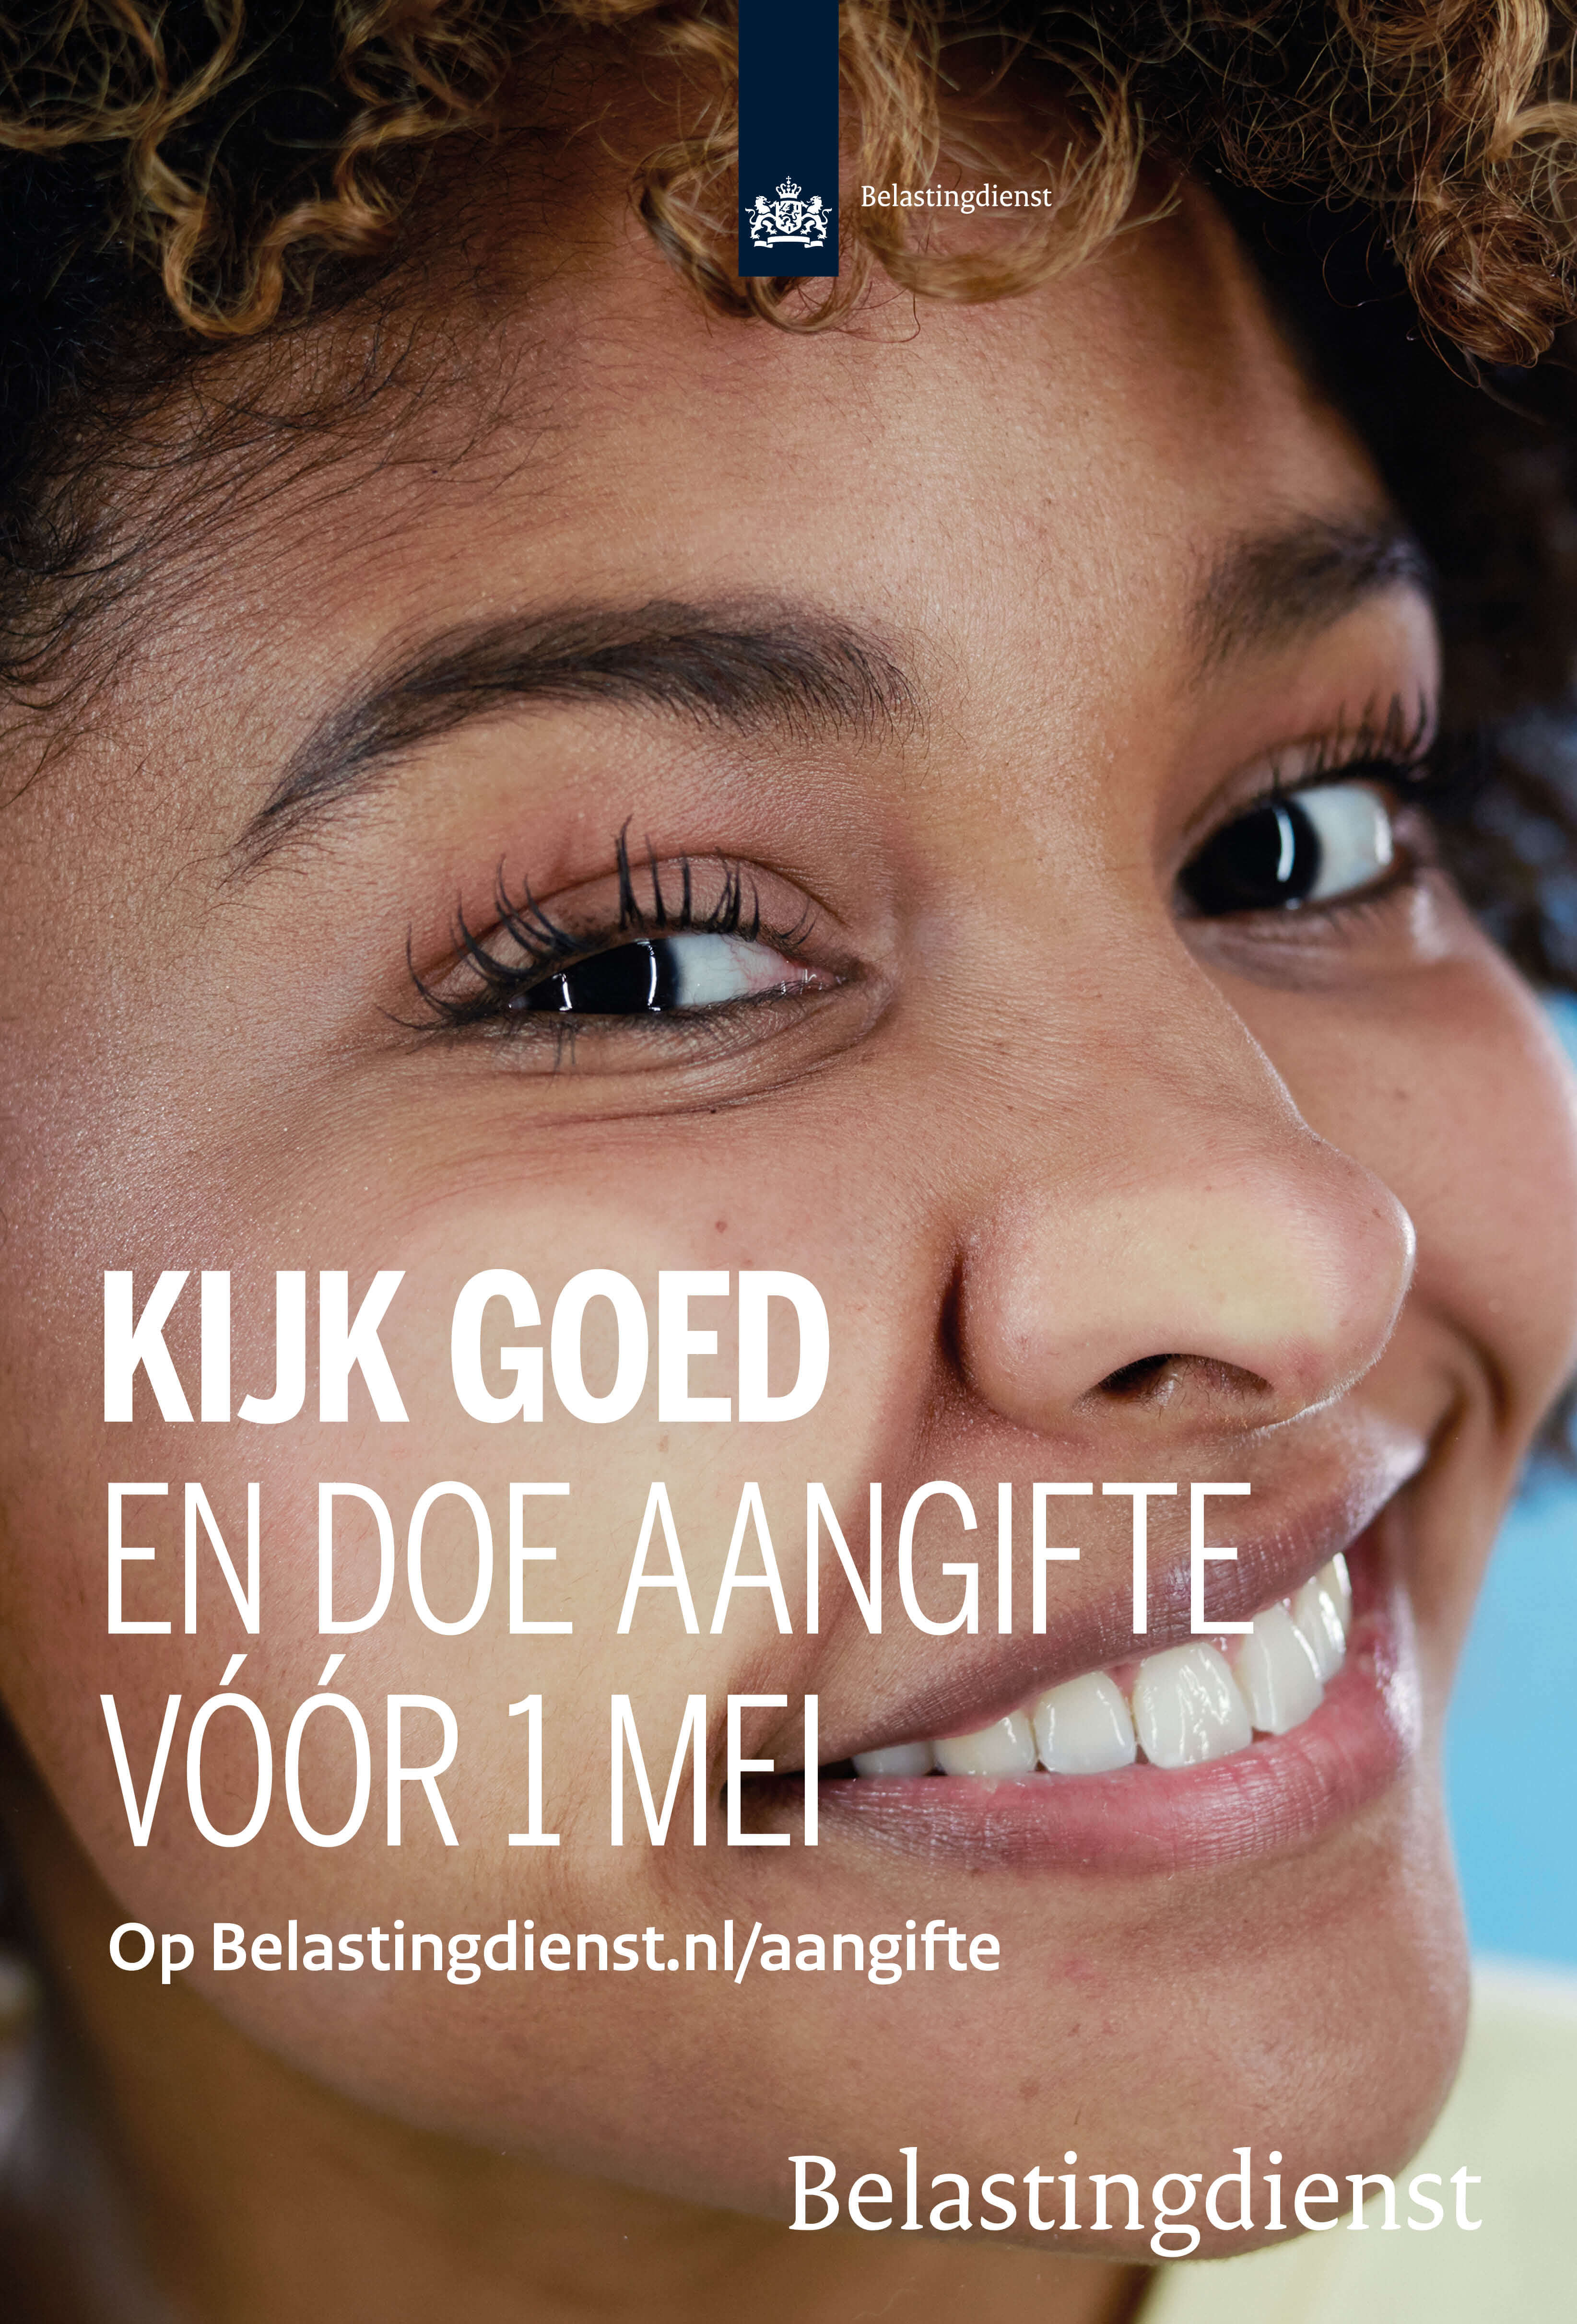 RO_Aangifte_abri_1160x1710B-klein3 Rene Nuijens fotografie photography art belastingdienst portrait portret reclame fotograaf Amsterdam